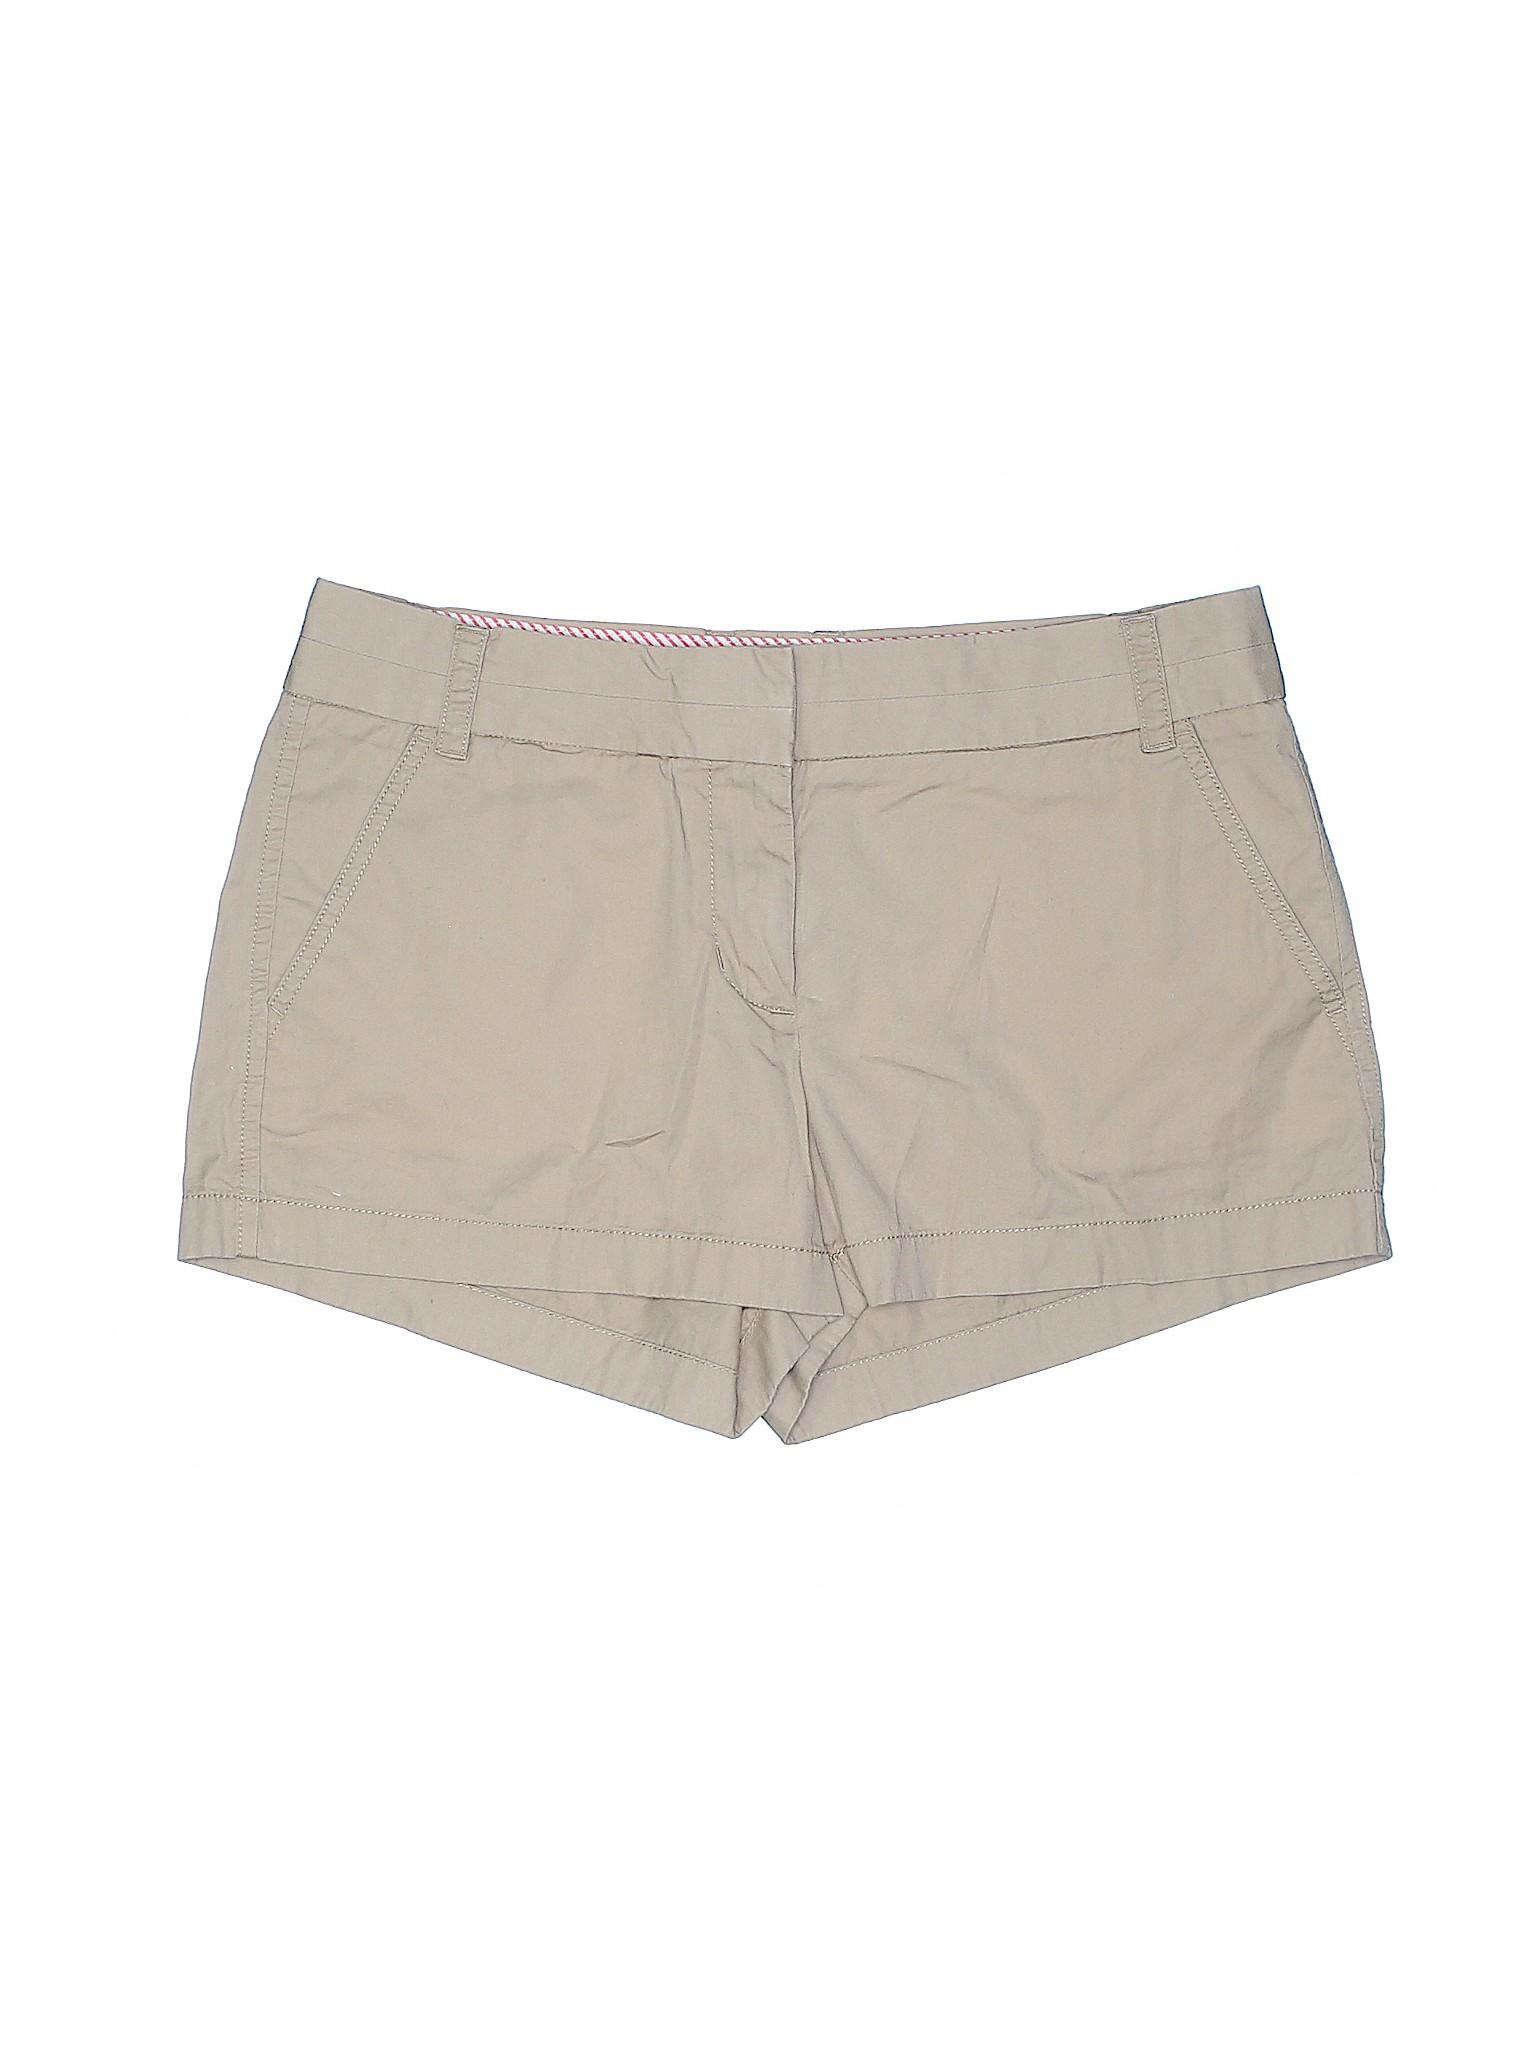 Factory Store J Khaki Crew Boutique Shorts BR8nPq